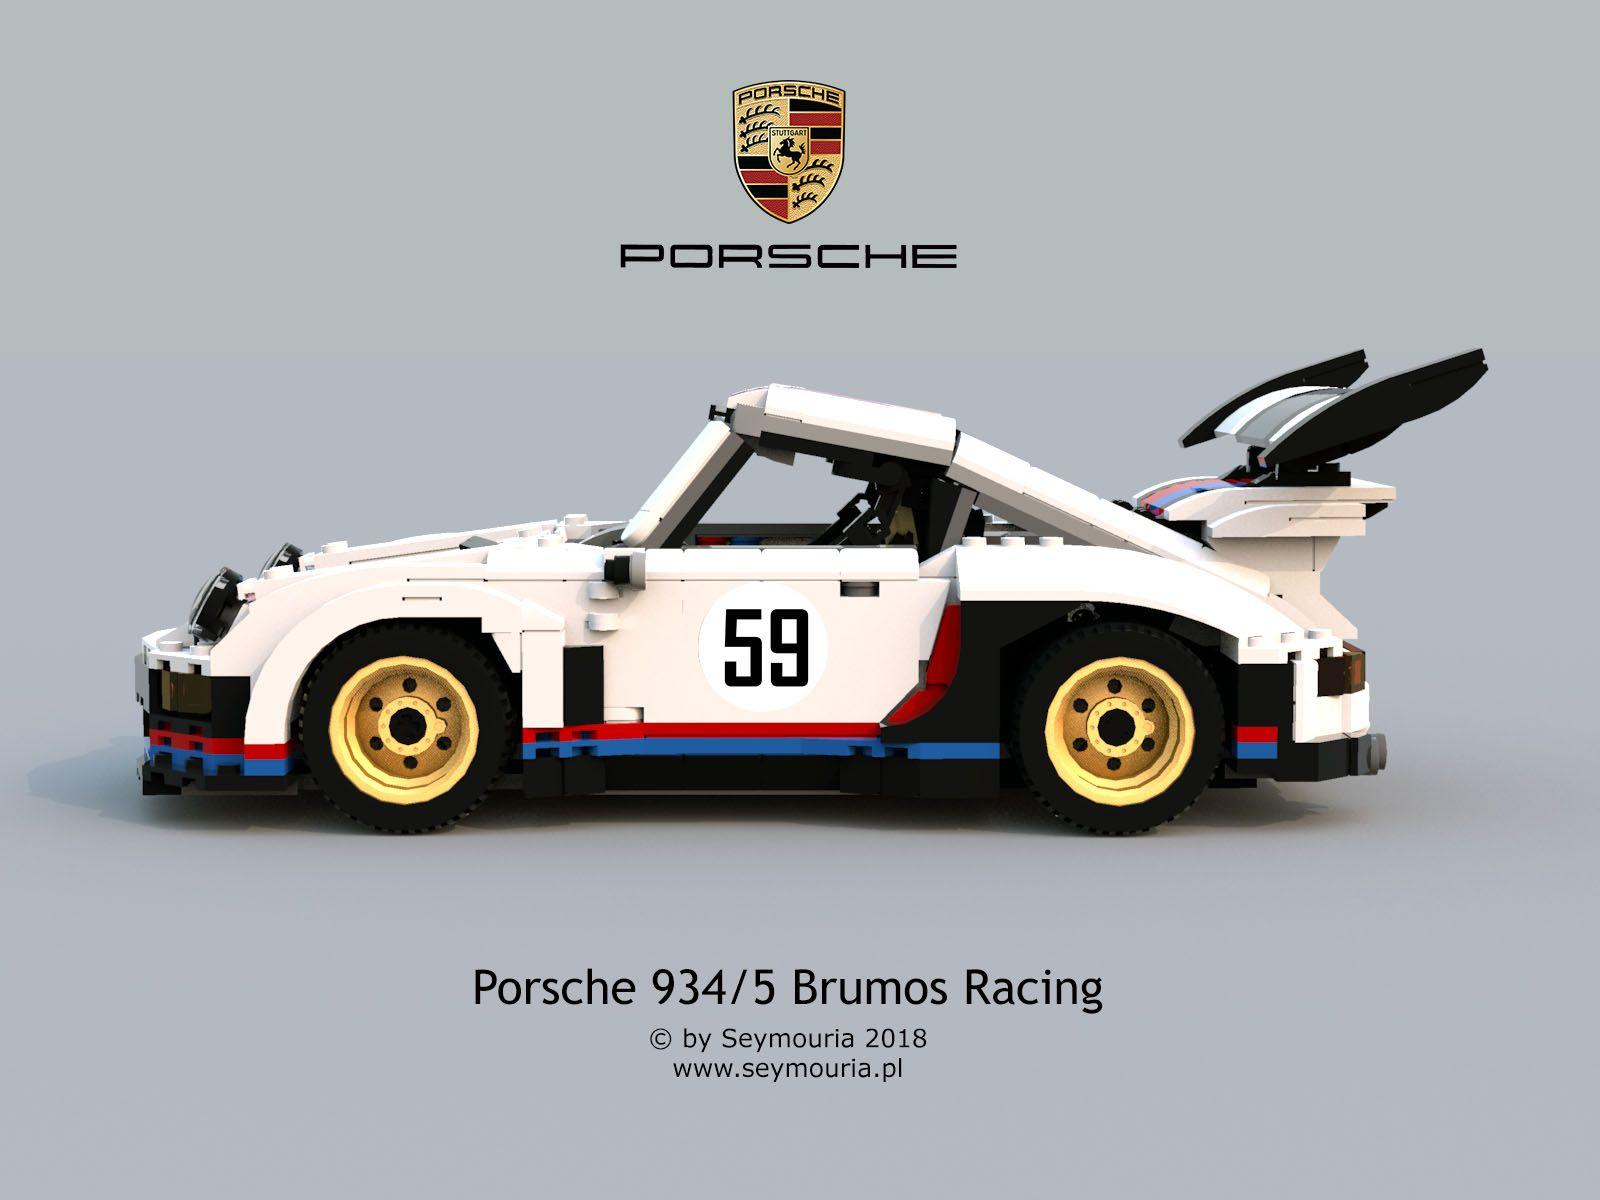 Porsche 934/5 Brumos Racing by Seymouria 2018 Lego Sport